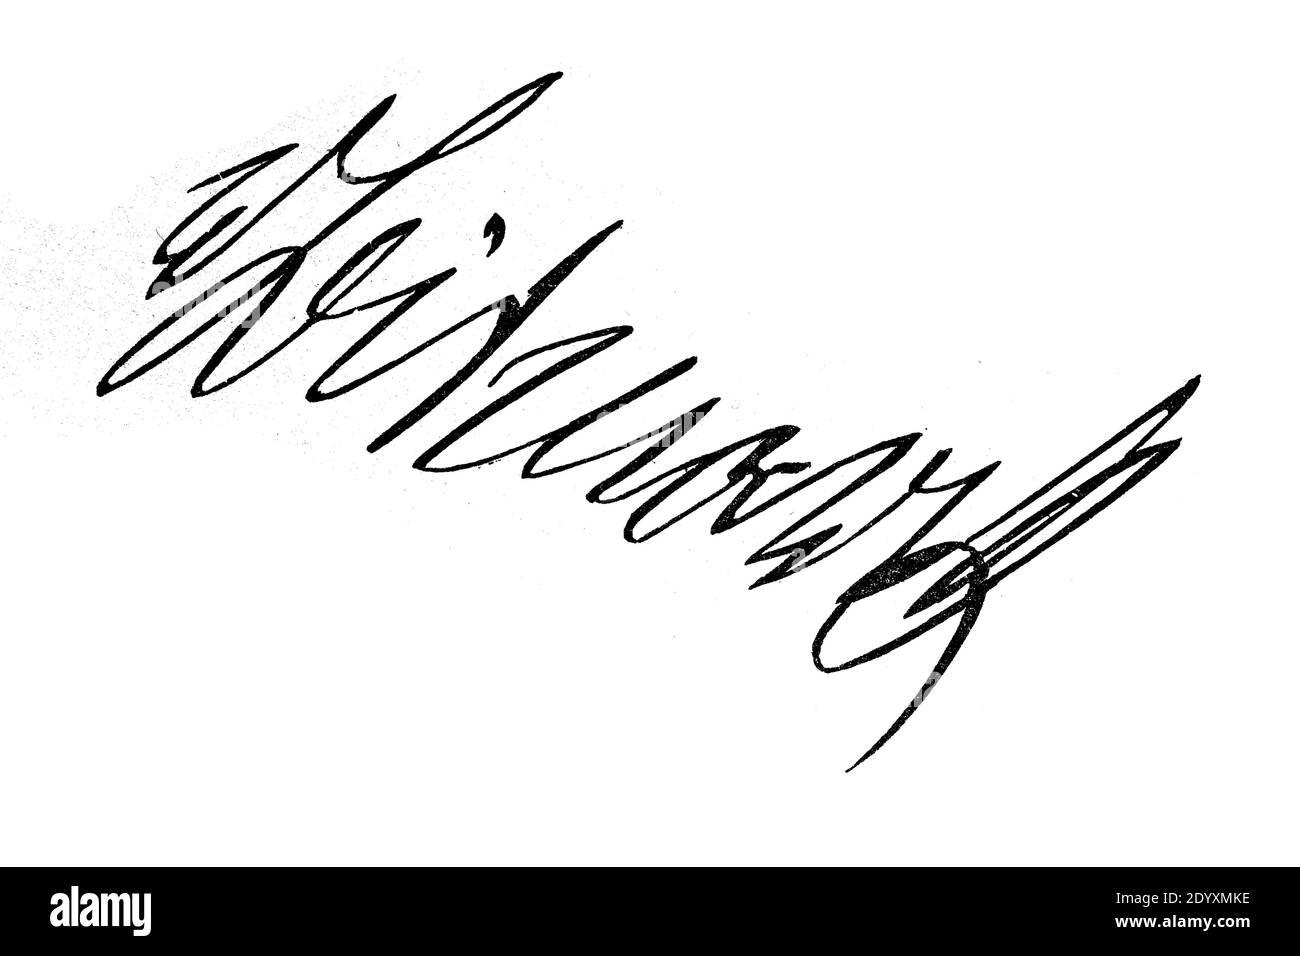 Signature, handwriting of von Bismarck  /  Unterschrift, Handschrift von Fürst von Bismarck, Historisch, historical, digital improved reproduction of an original from the 19th century / digitale Reproduktion einer Originalvorlage aus dem 19. Jahrhundert, Stock Photo